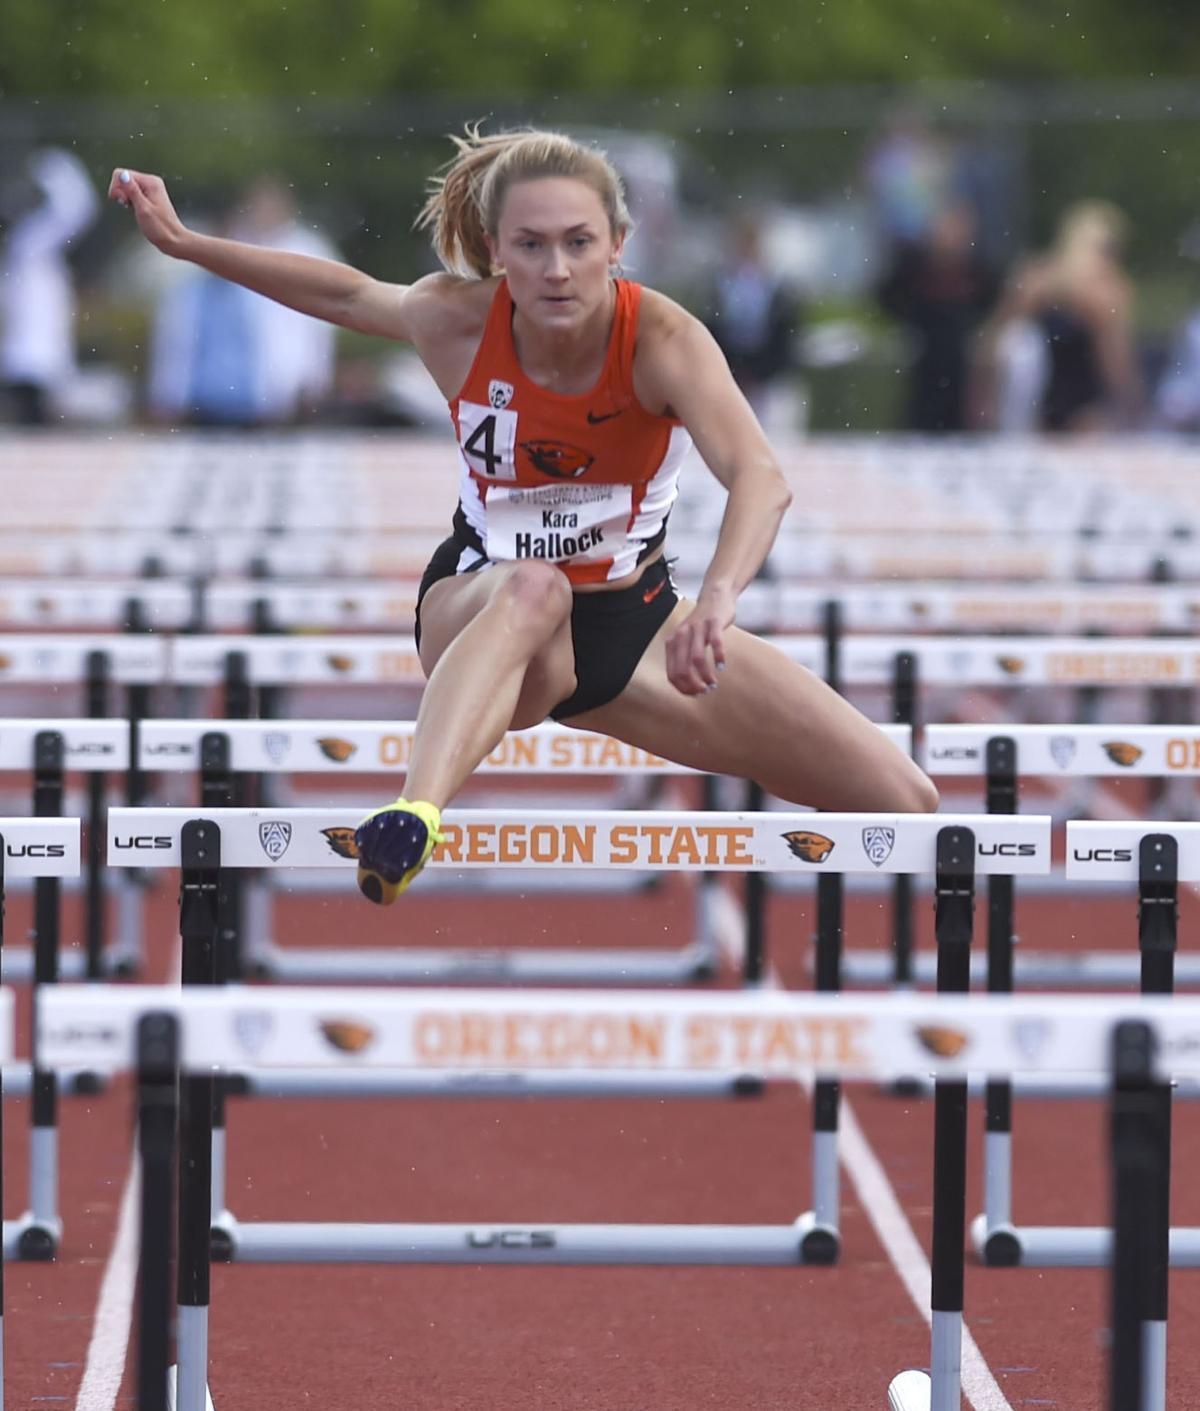 Hallock - NCAA preview - hurdles